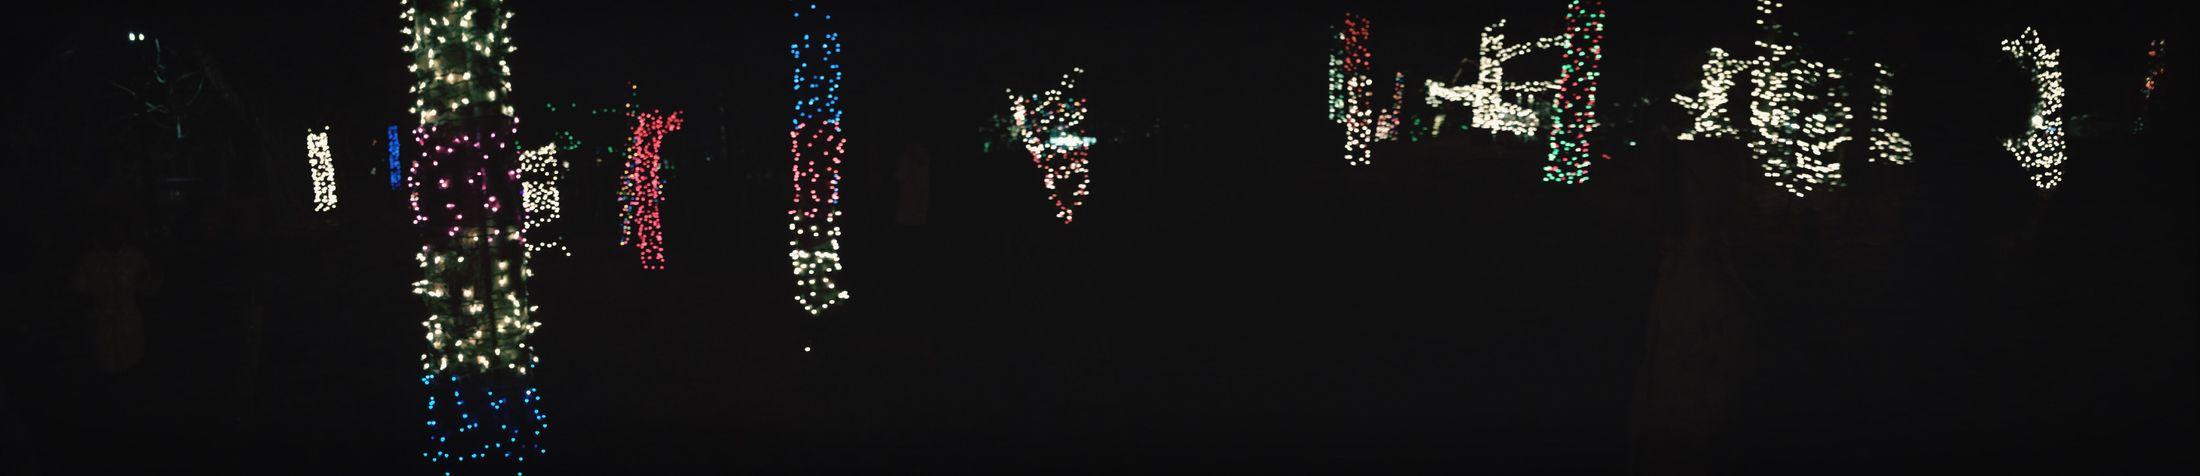 Light Normalsy Merry Christmas! Christmas Popular Photo Popular Photos Winterwonderland Nofilter nNoël